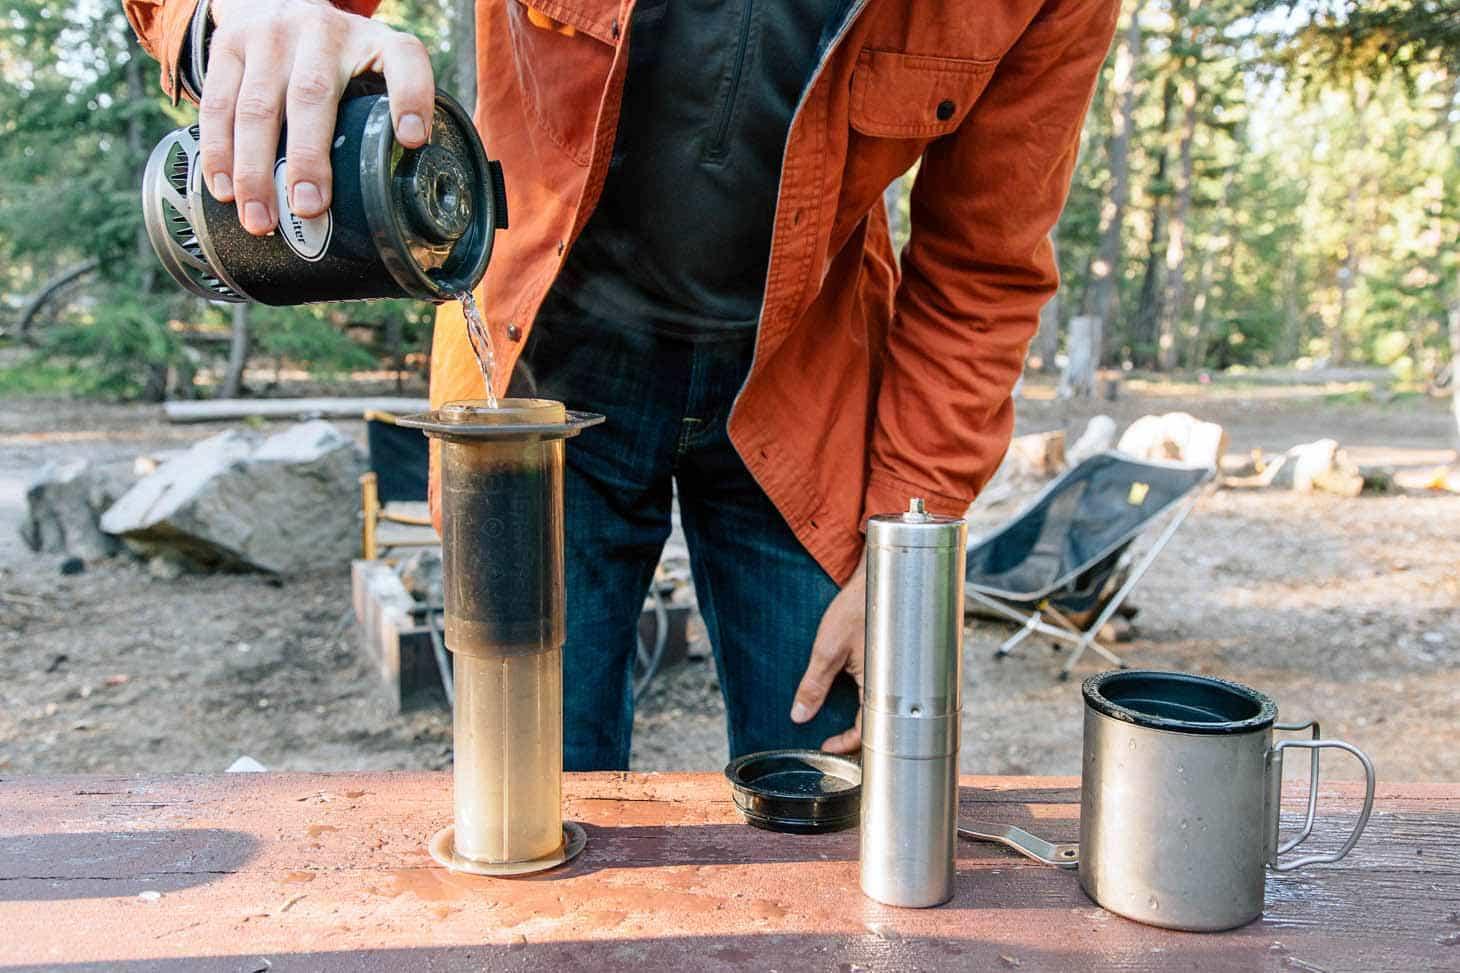 Michael making coffee using an Aeropress